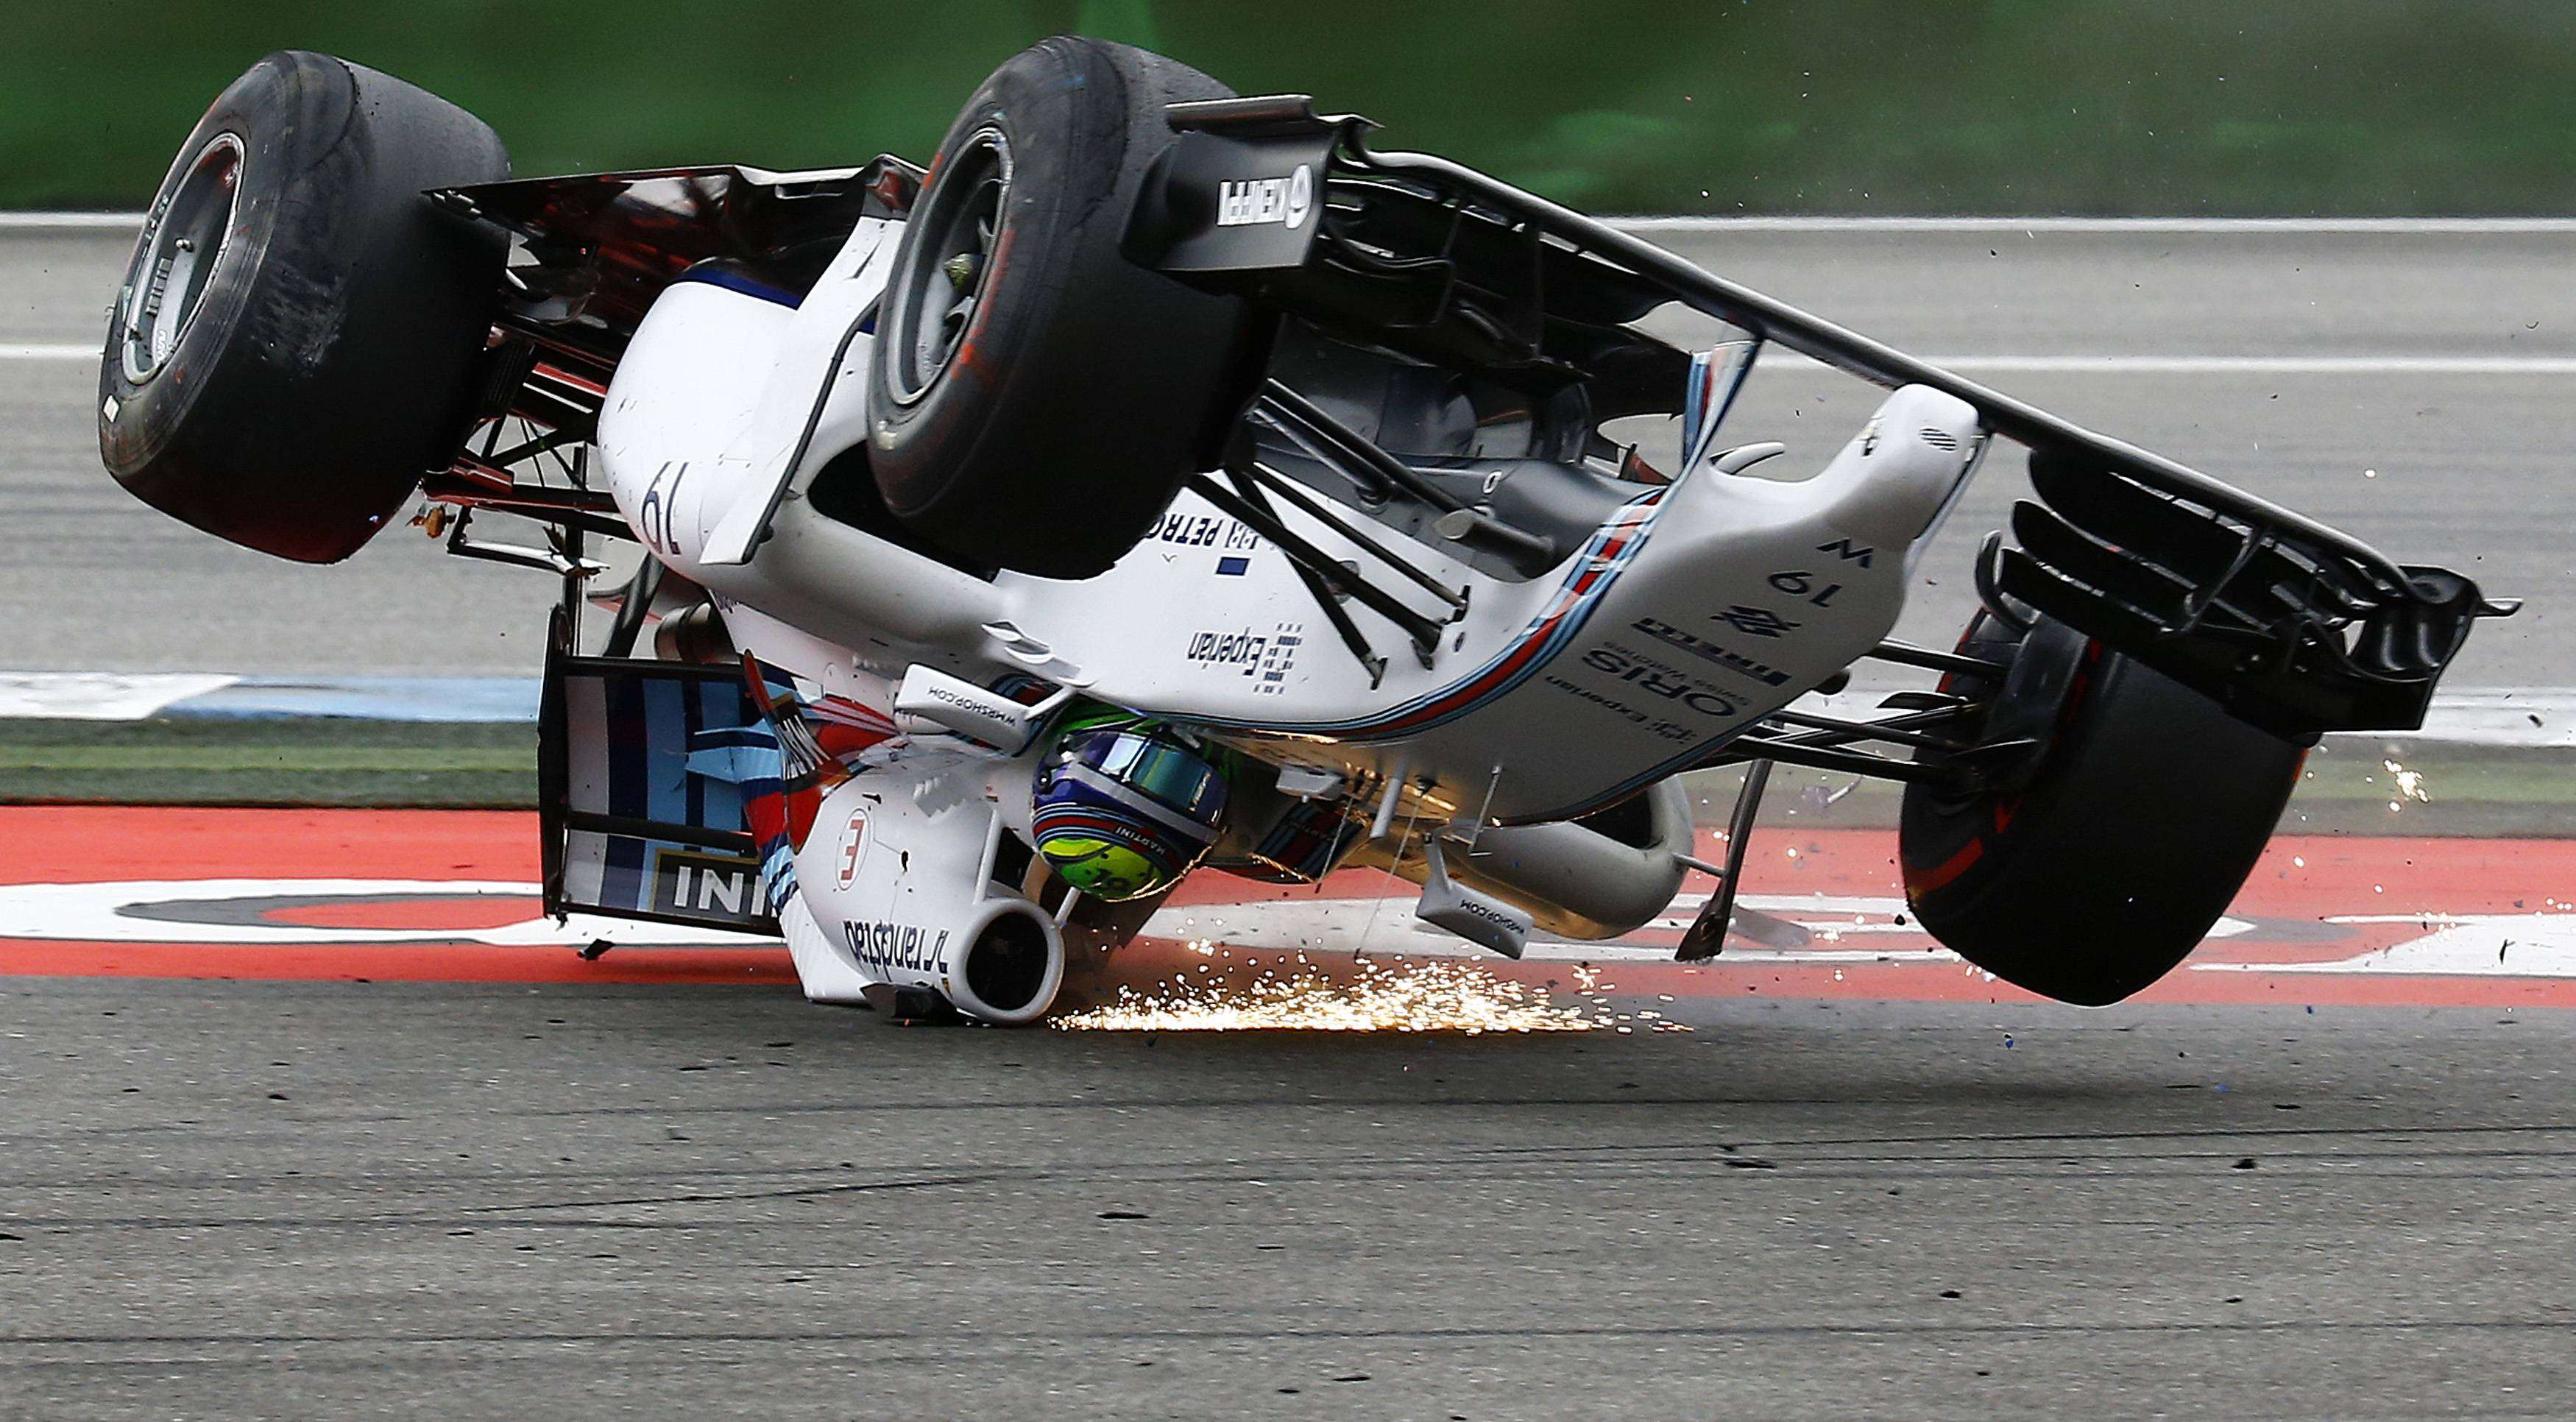 Felipe Massa capotou na primeira curva, após bater em Magnussen Foto: Kai Pfaffenbach/Reuters